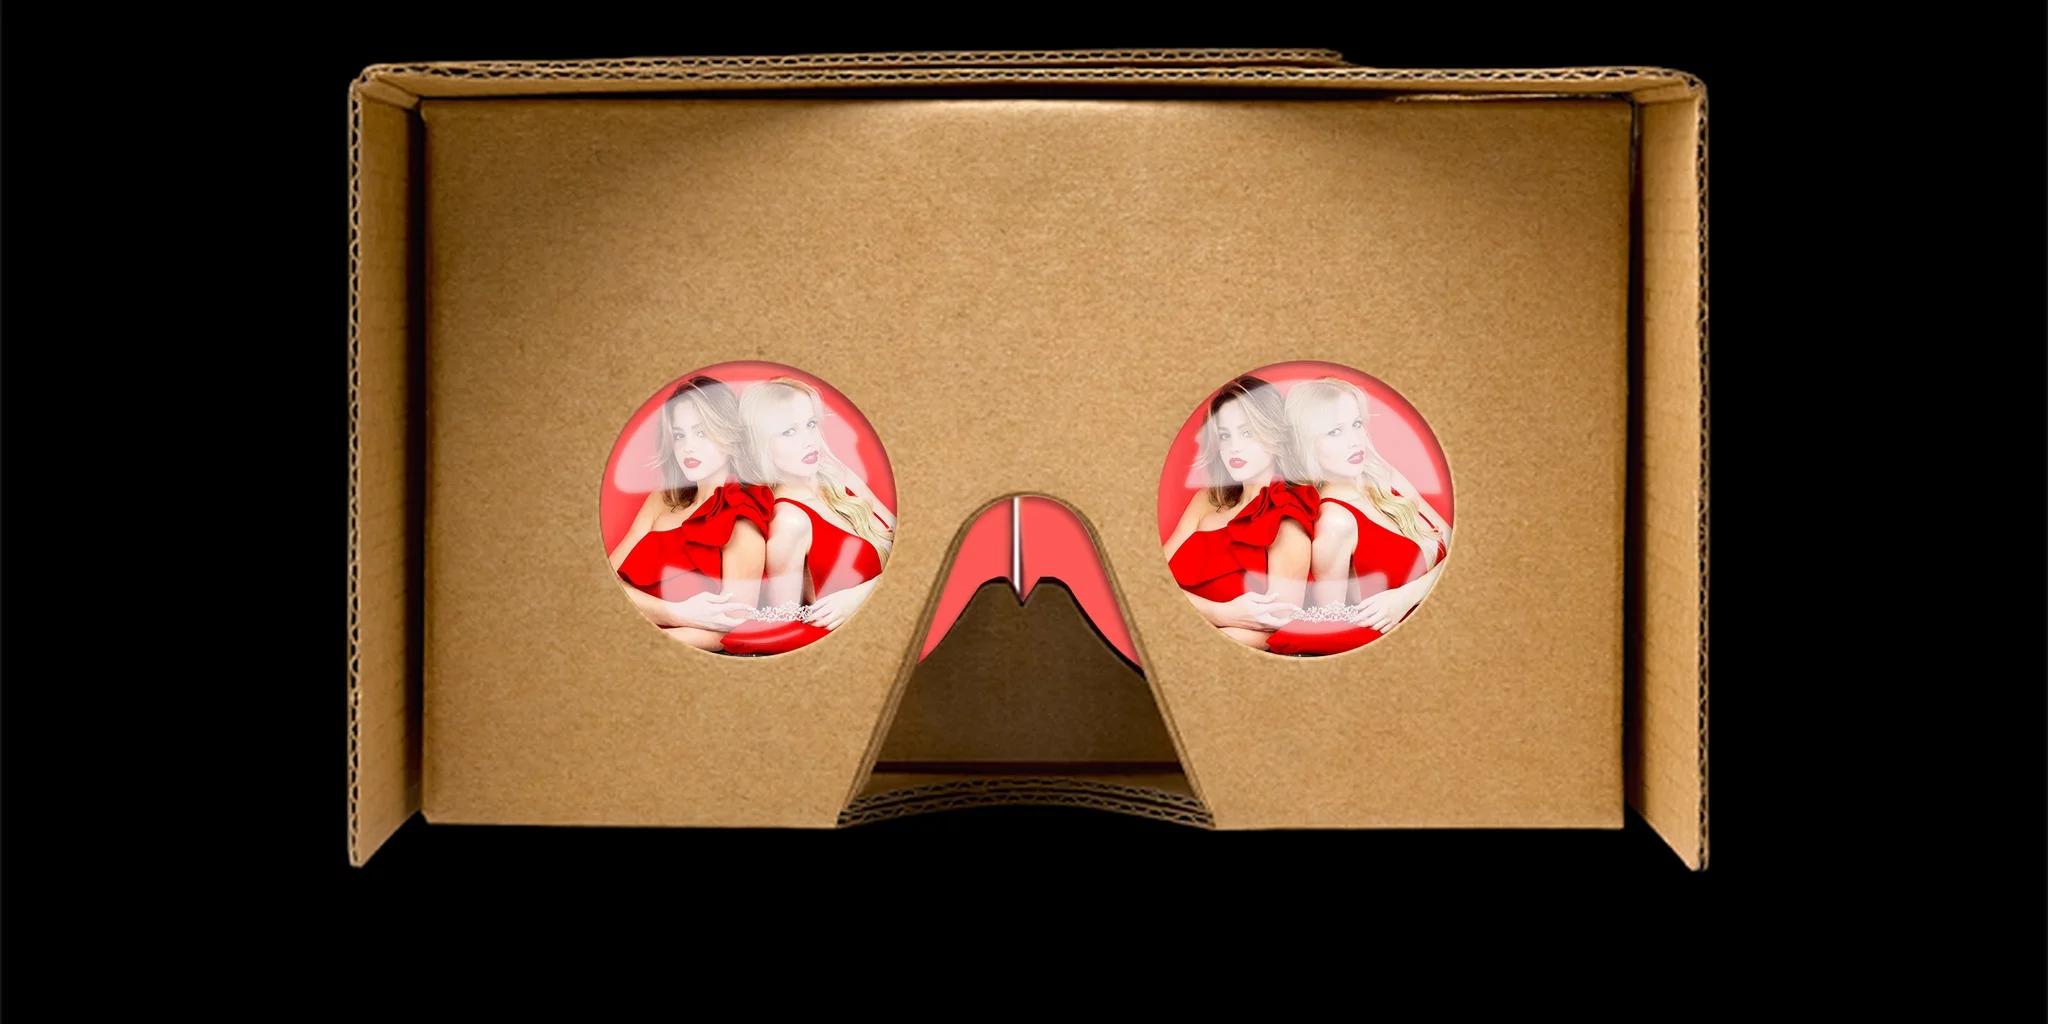 VR Porn – A Positive For Human Psychology